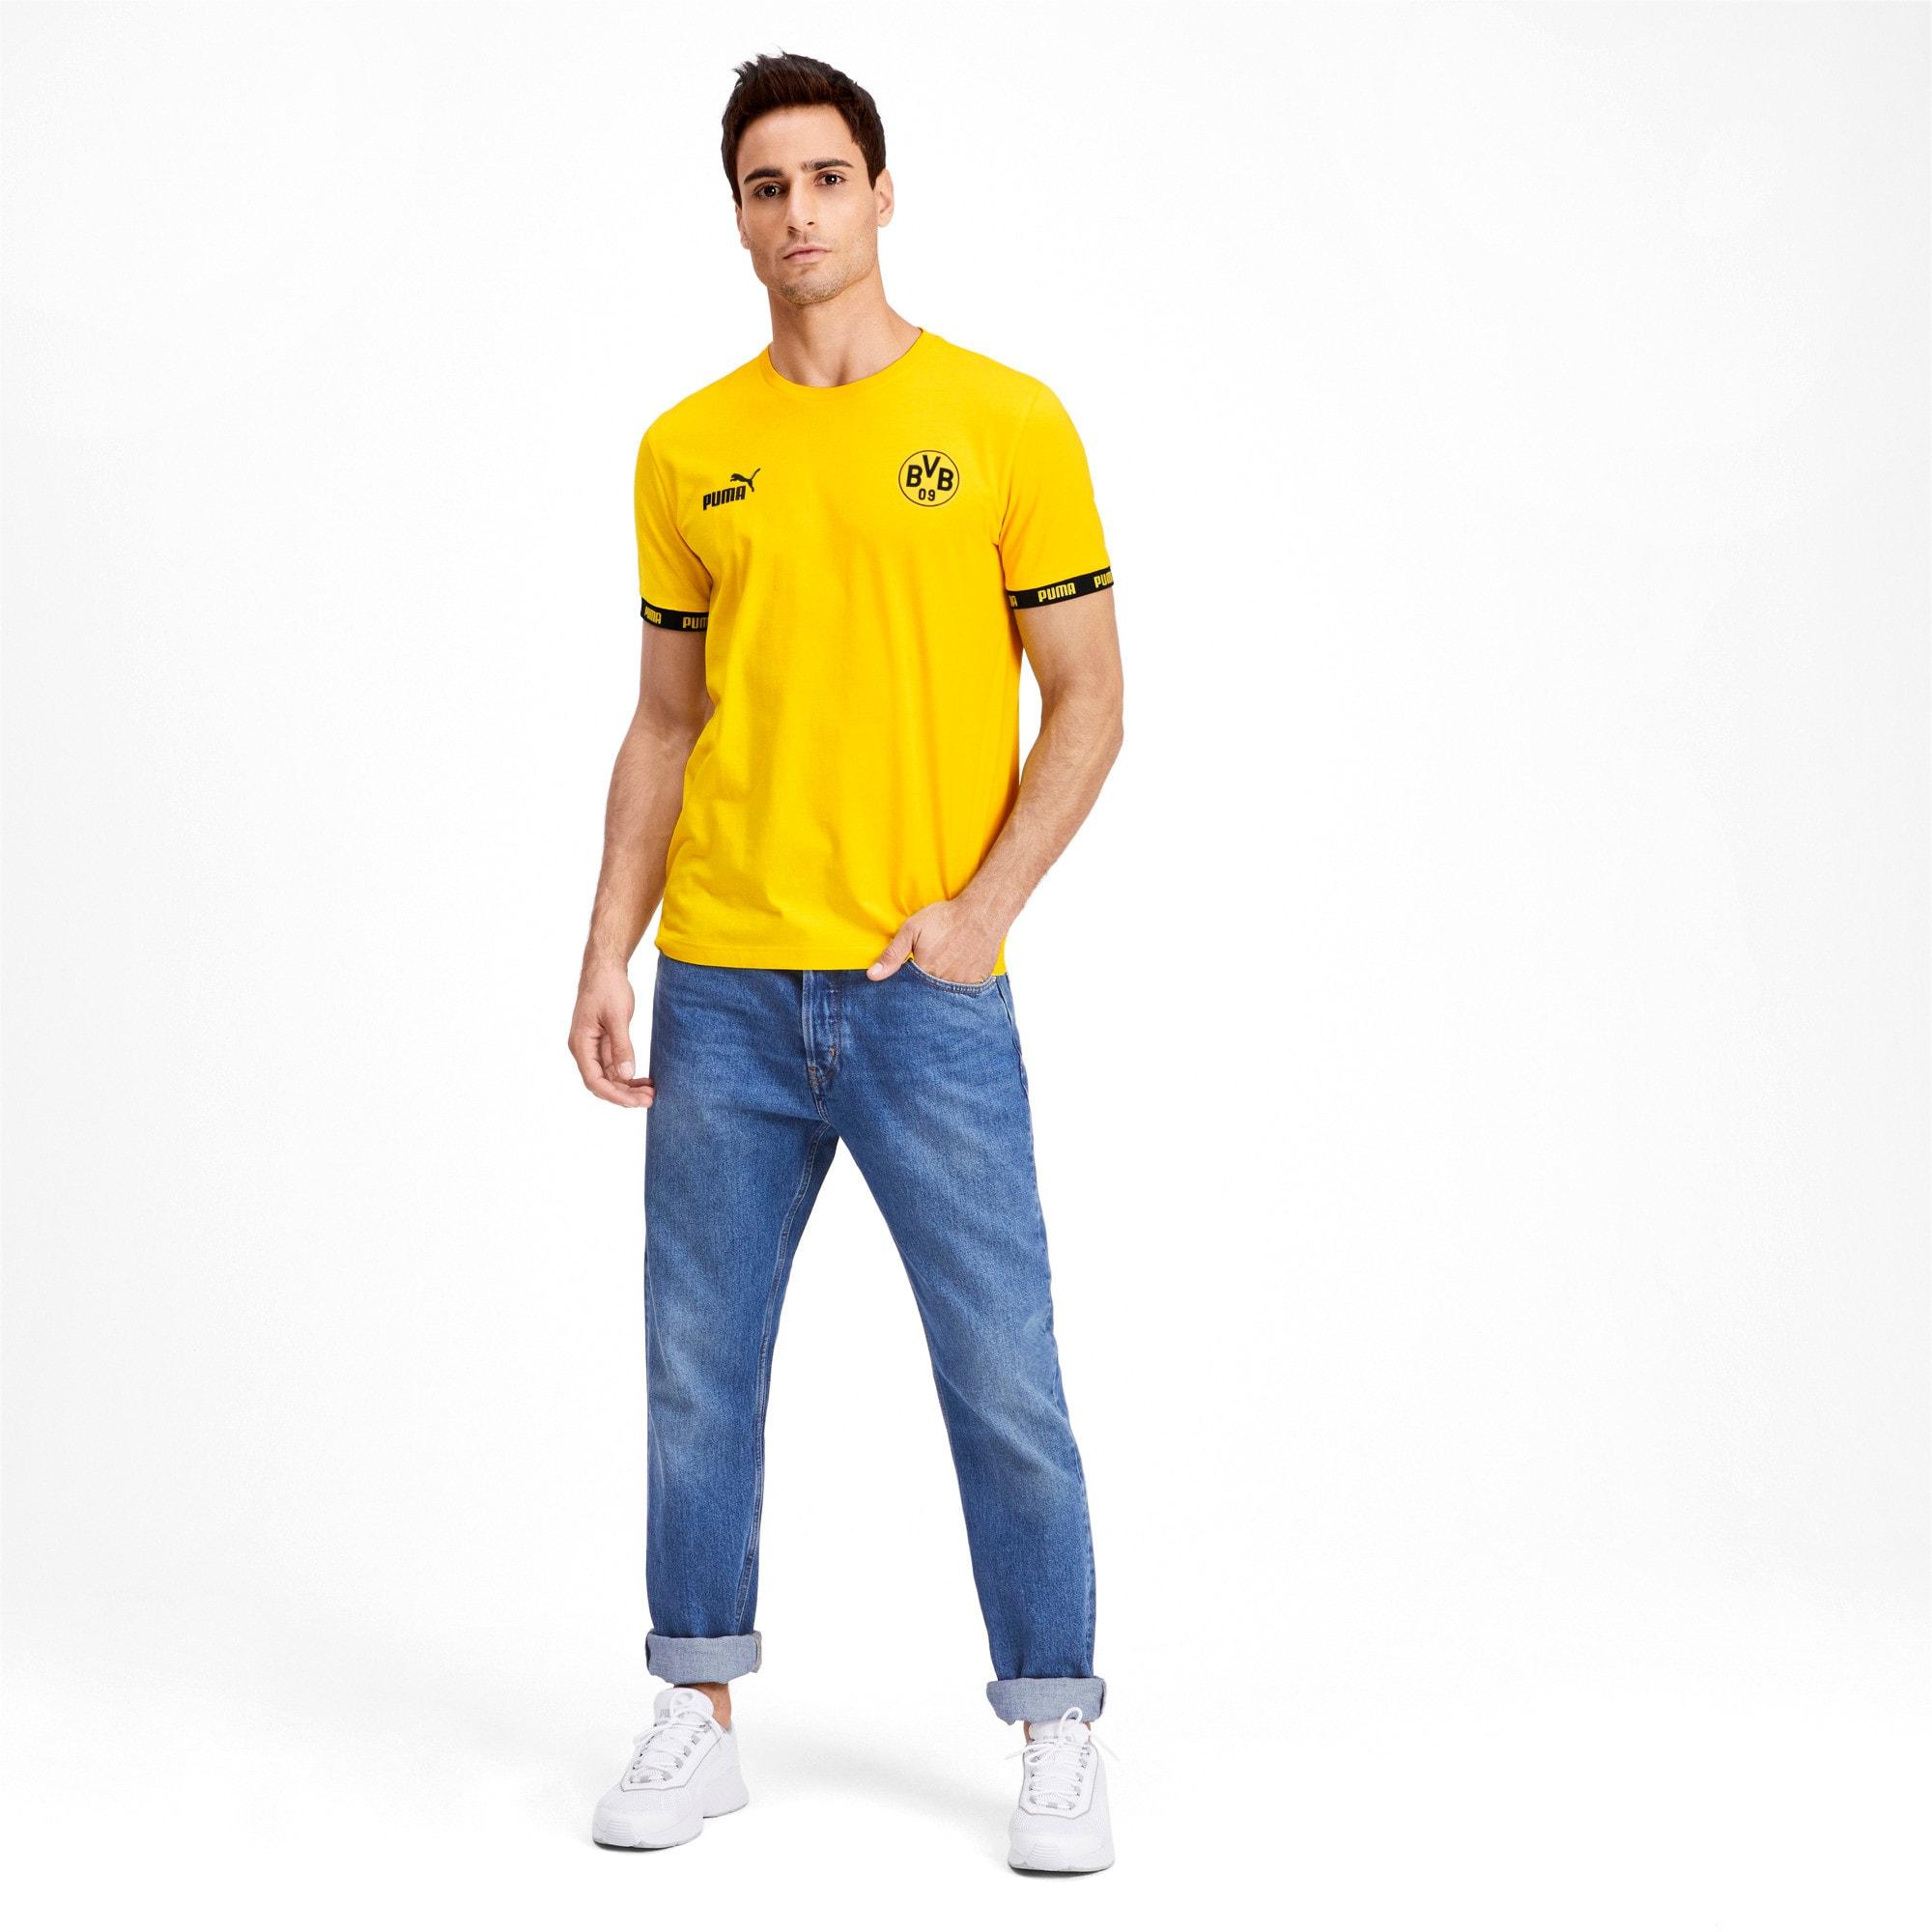 Thumbnail 3 of BVB Football Culture Men's Tee, Cyber Yellow, medium